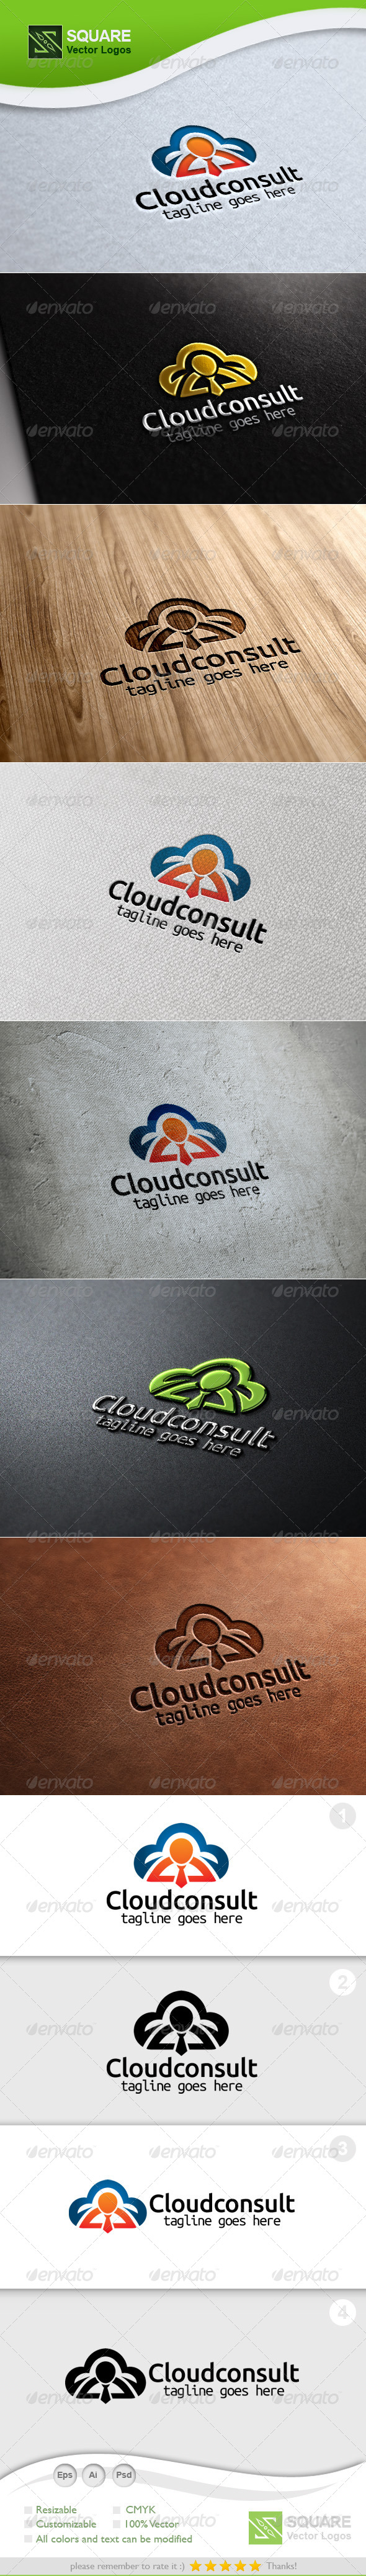 Cloud, Consultancy Vector Logo Template - Symbols Logo Templates